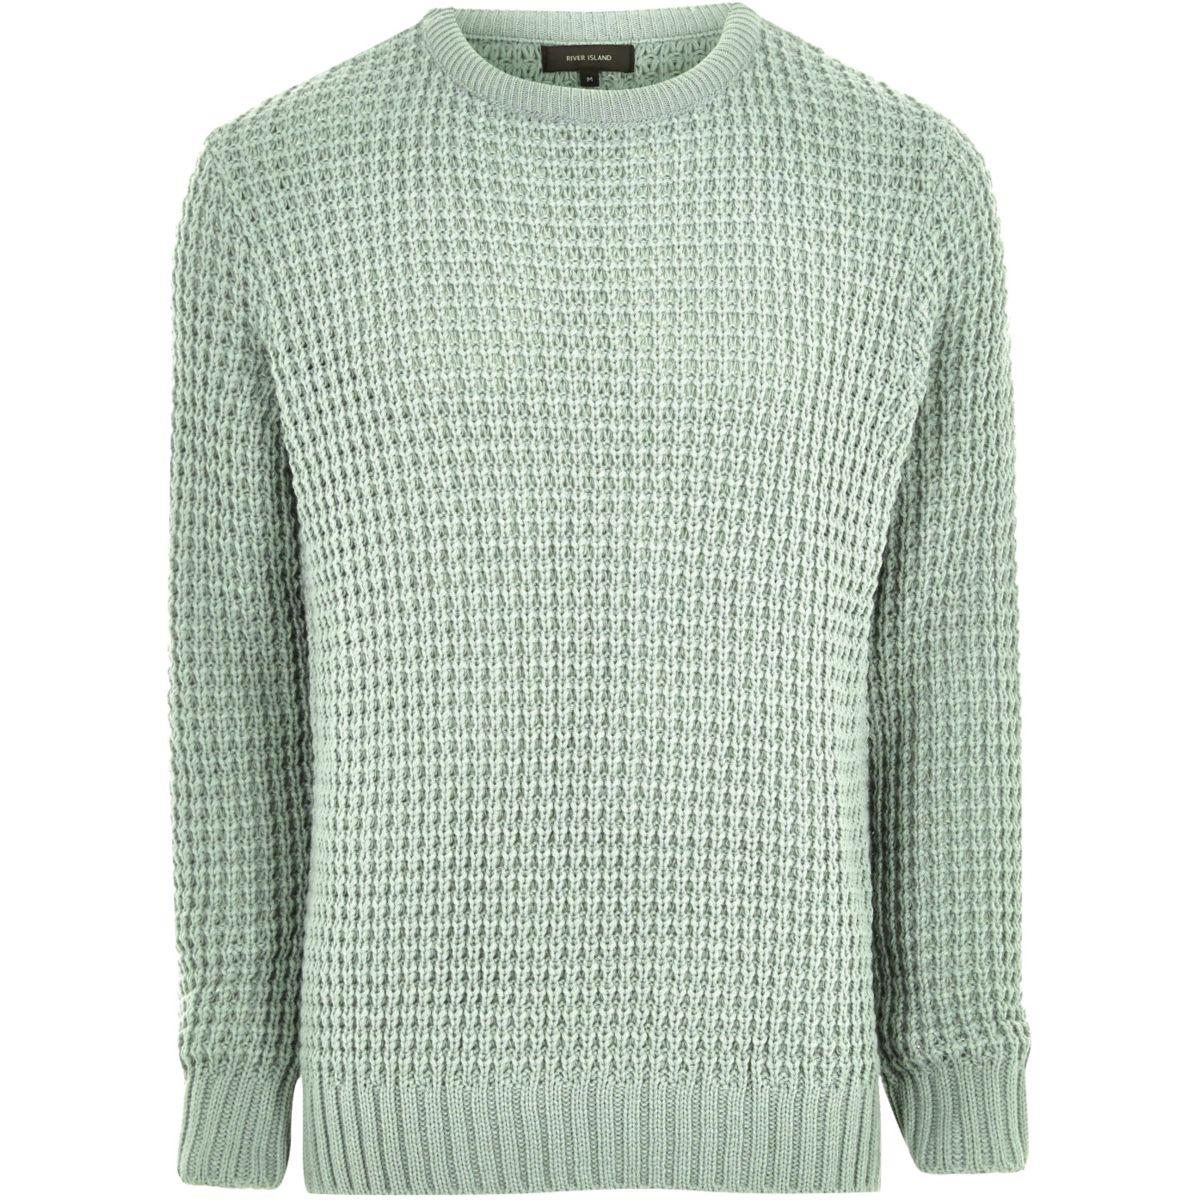 Mint green textured waffle knit sweater